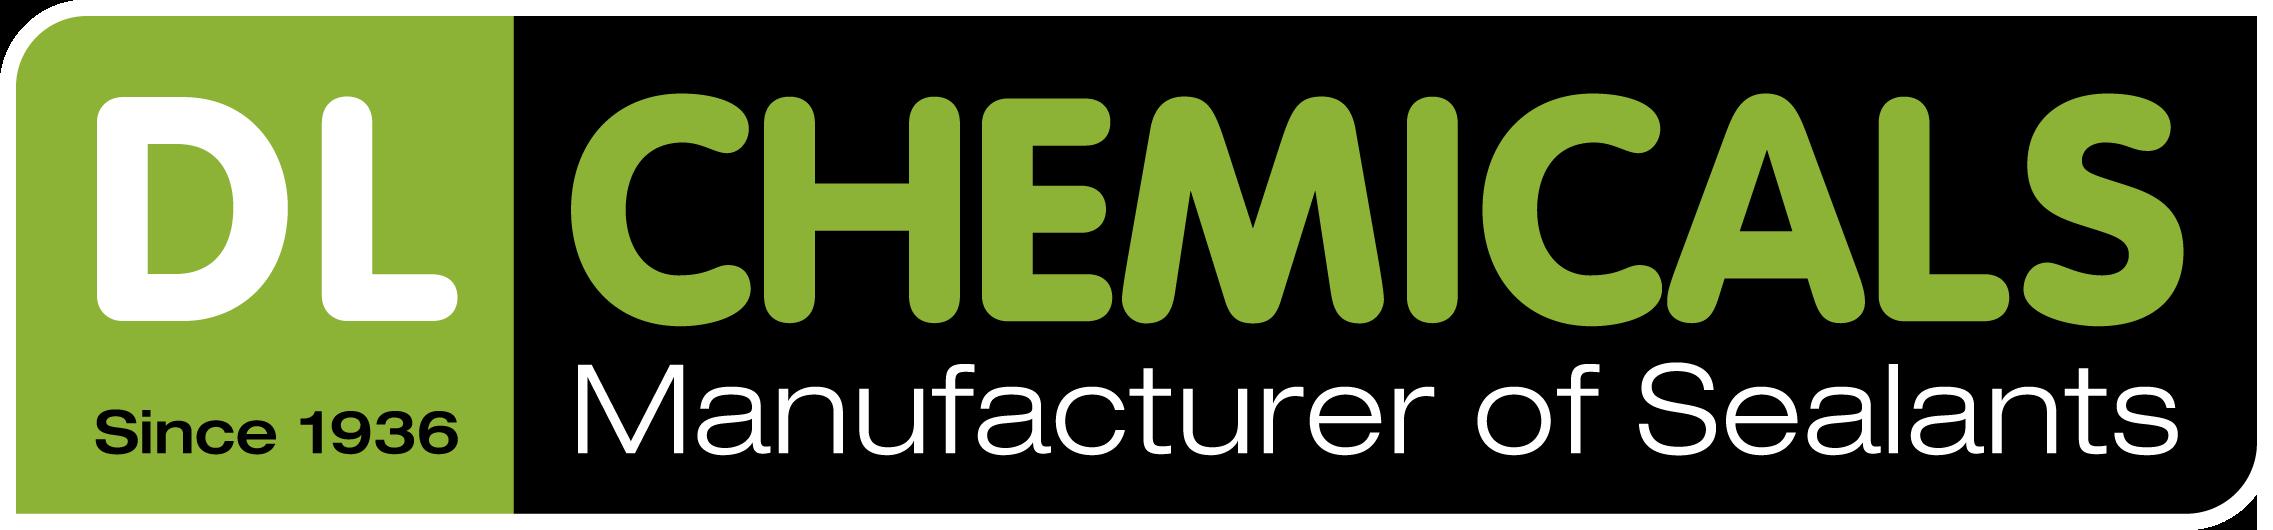 DL Chemicals logo cmyk